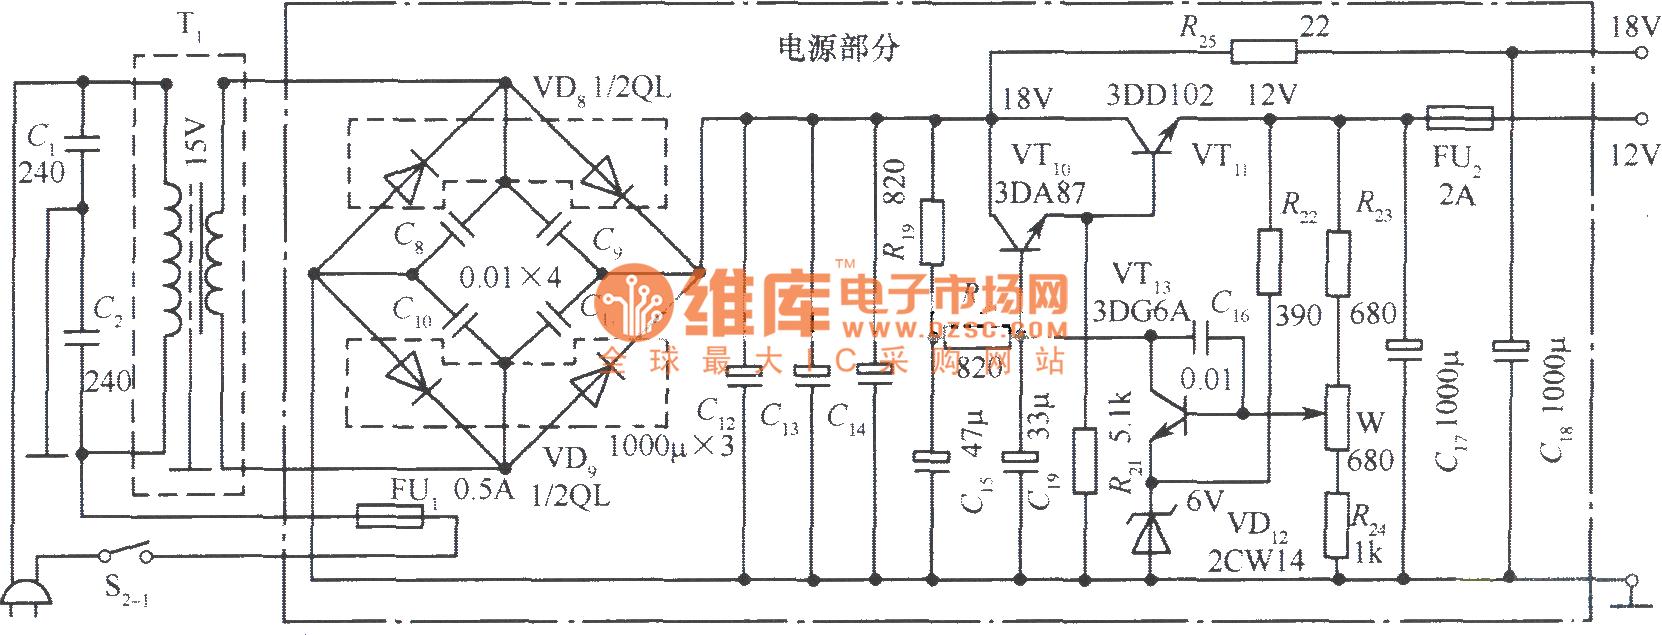 18v power supply schematic  18v  free engine image for